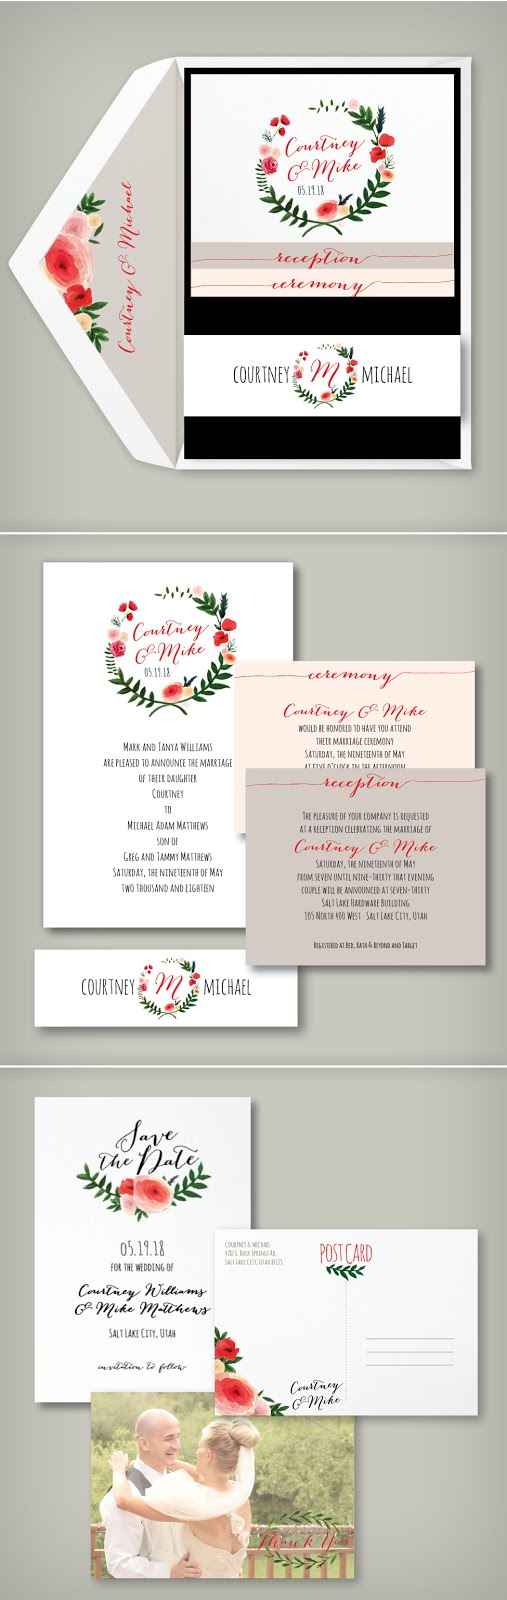 Wedding invitation blog perfect pocket wedding invitation monicamarmolfo Images